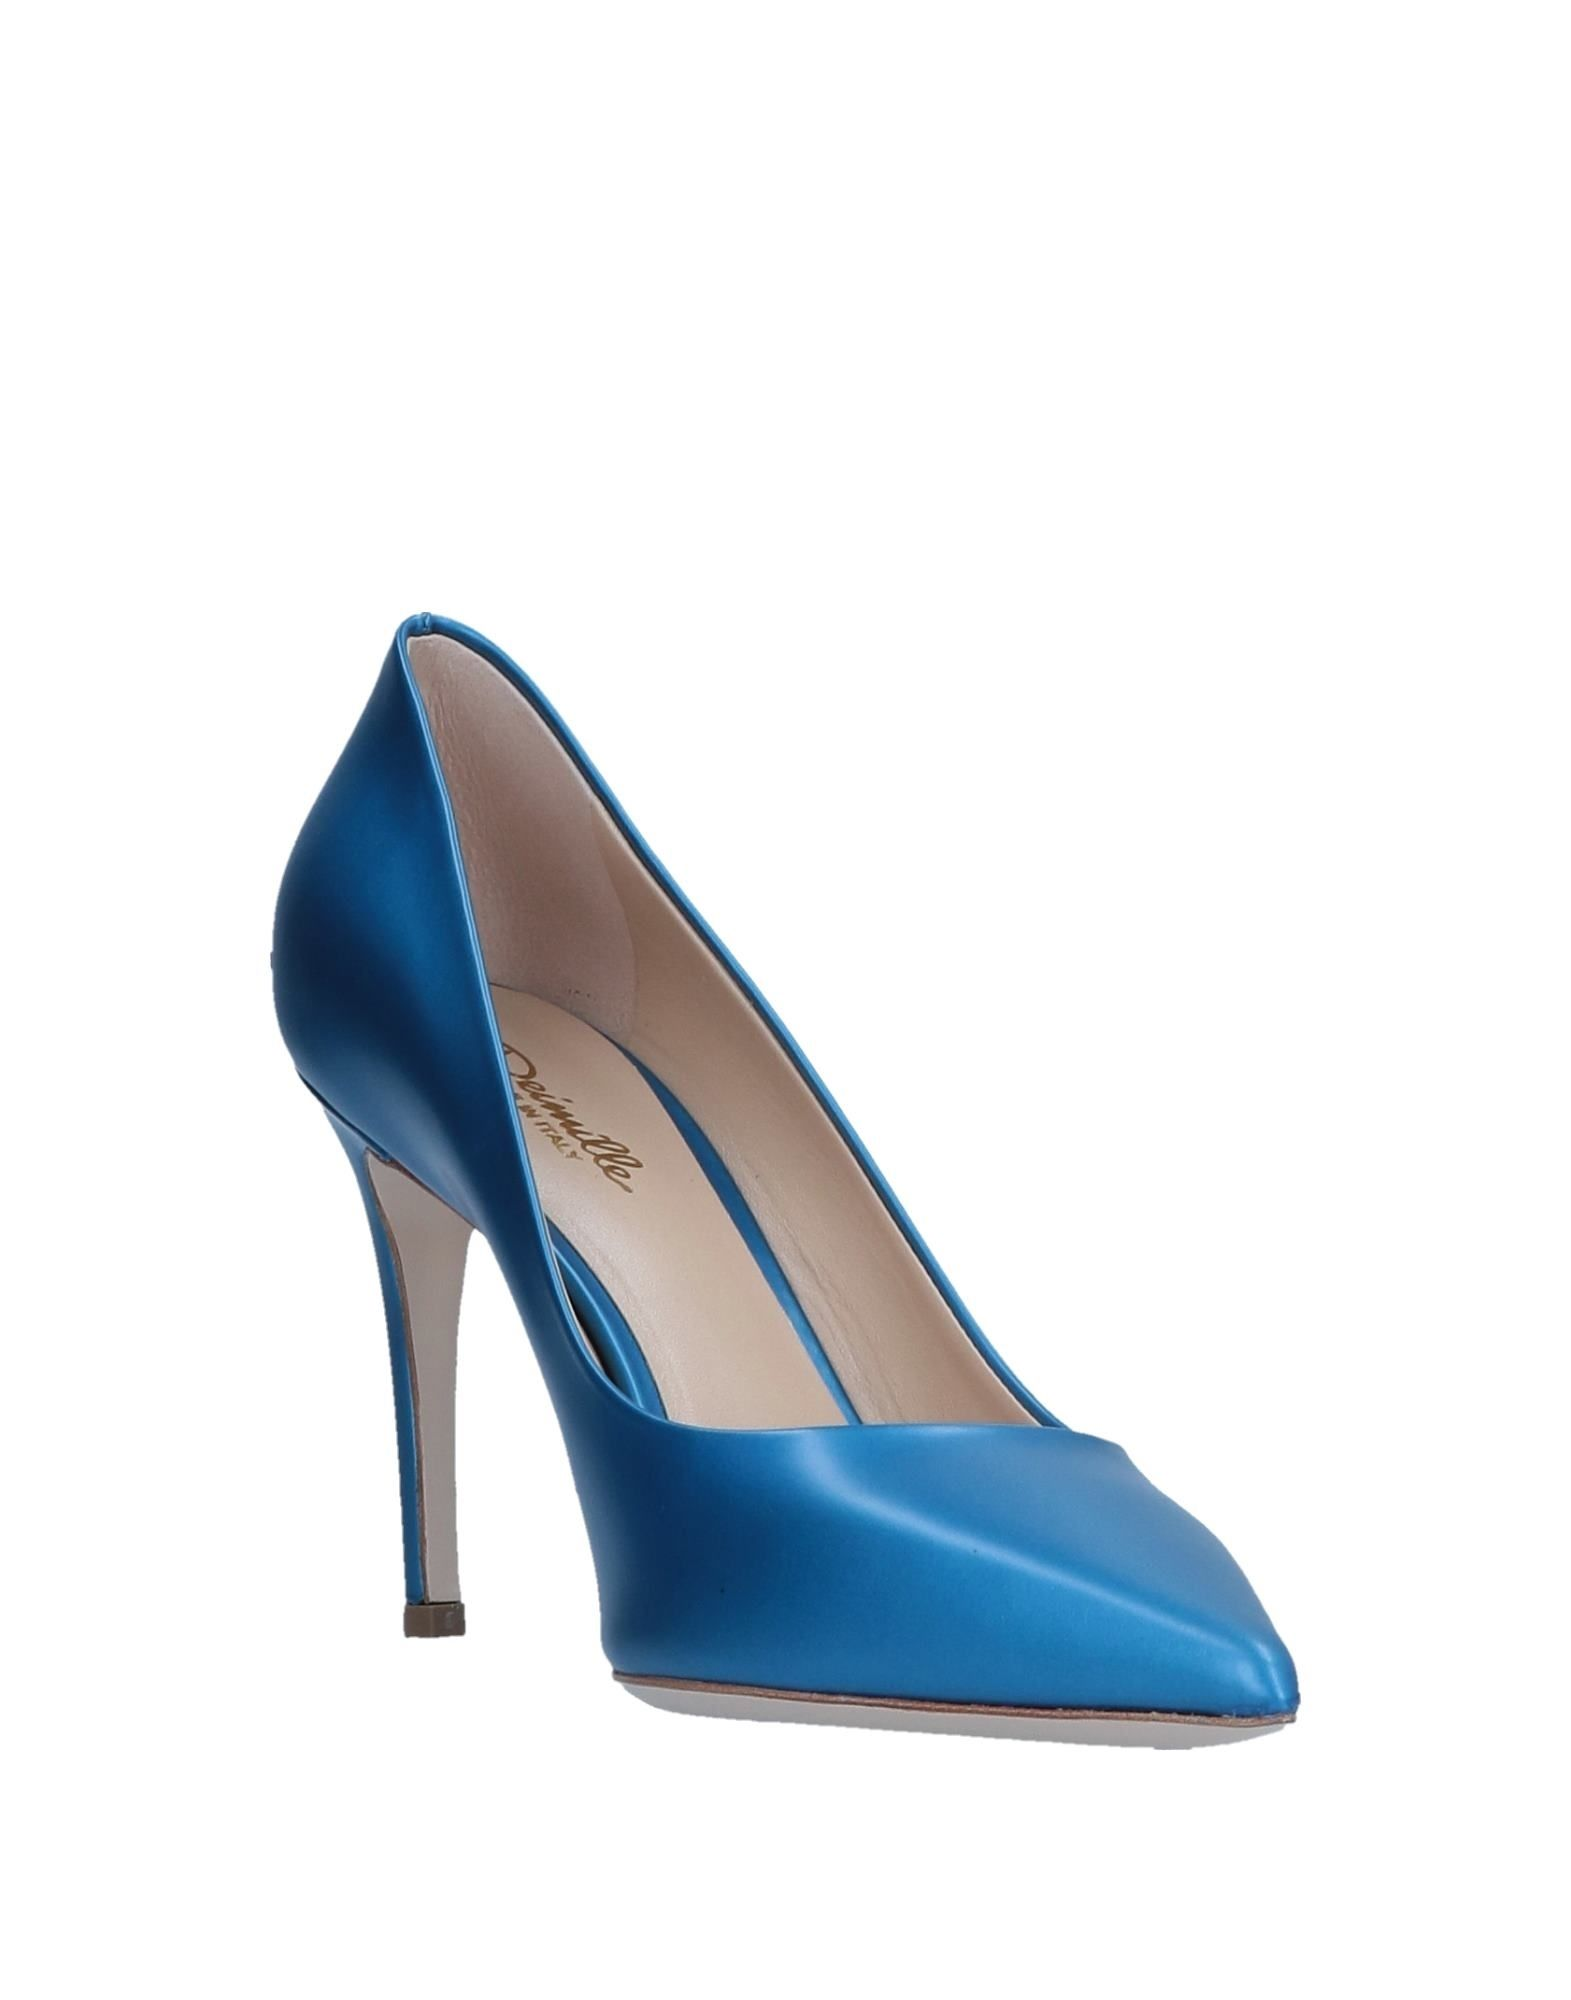 Stilvolle billige Schuhe Damen Deimille Pumps Damen Schuhe  11557139HB 479fe6